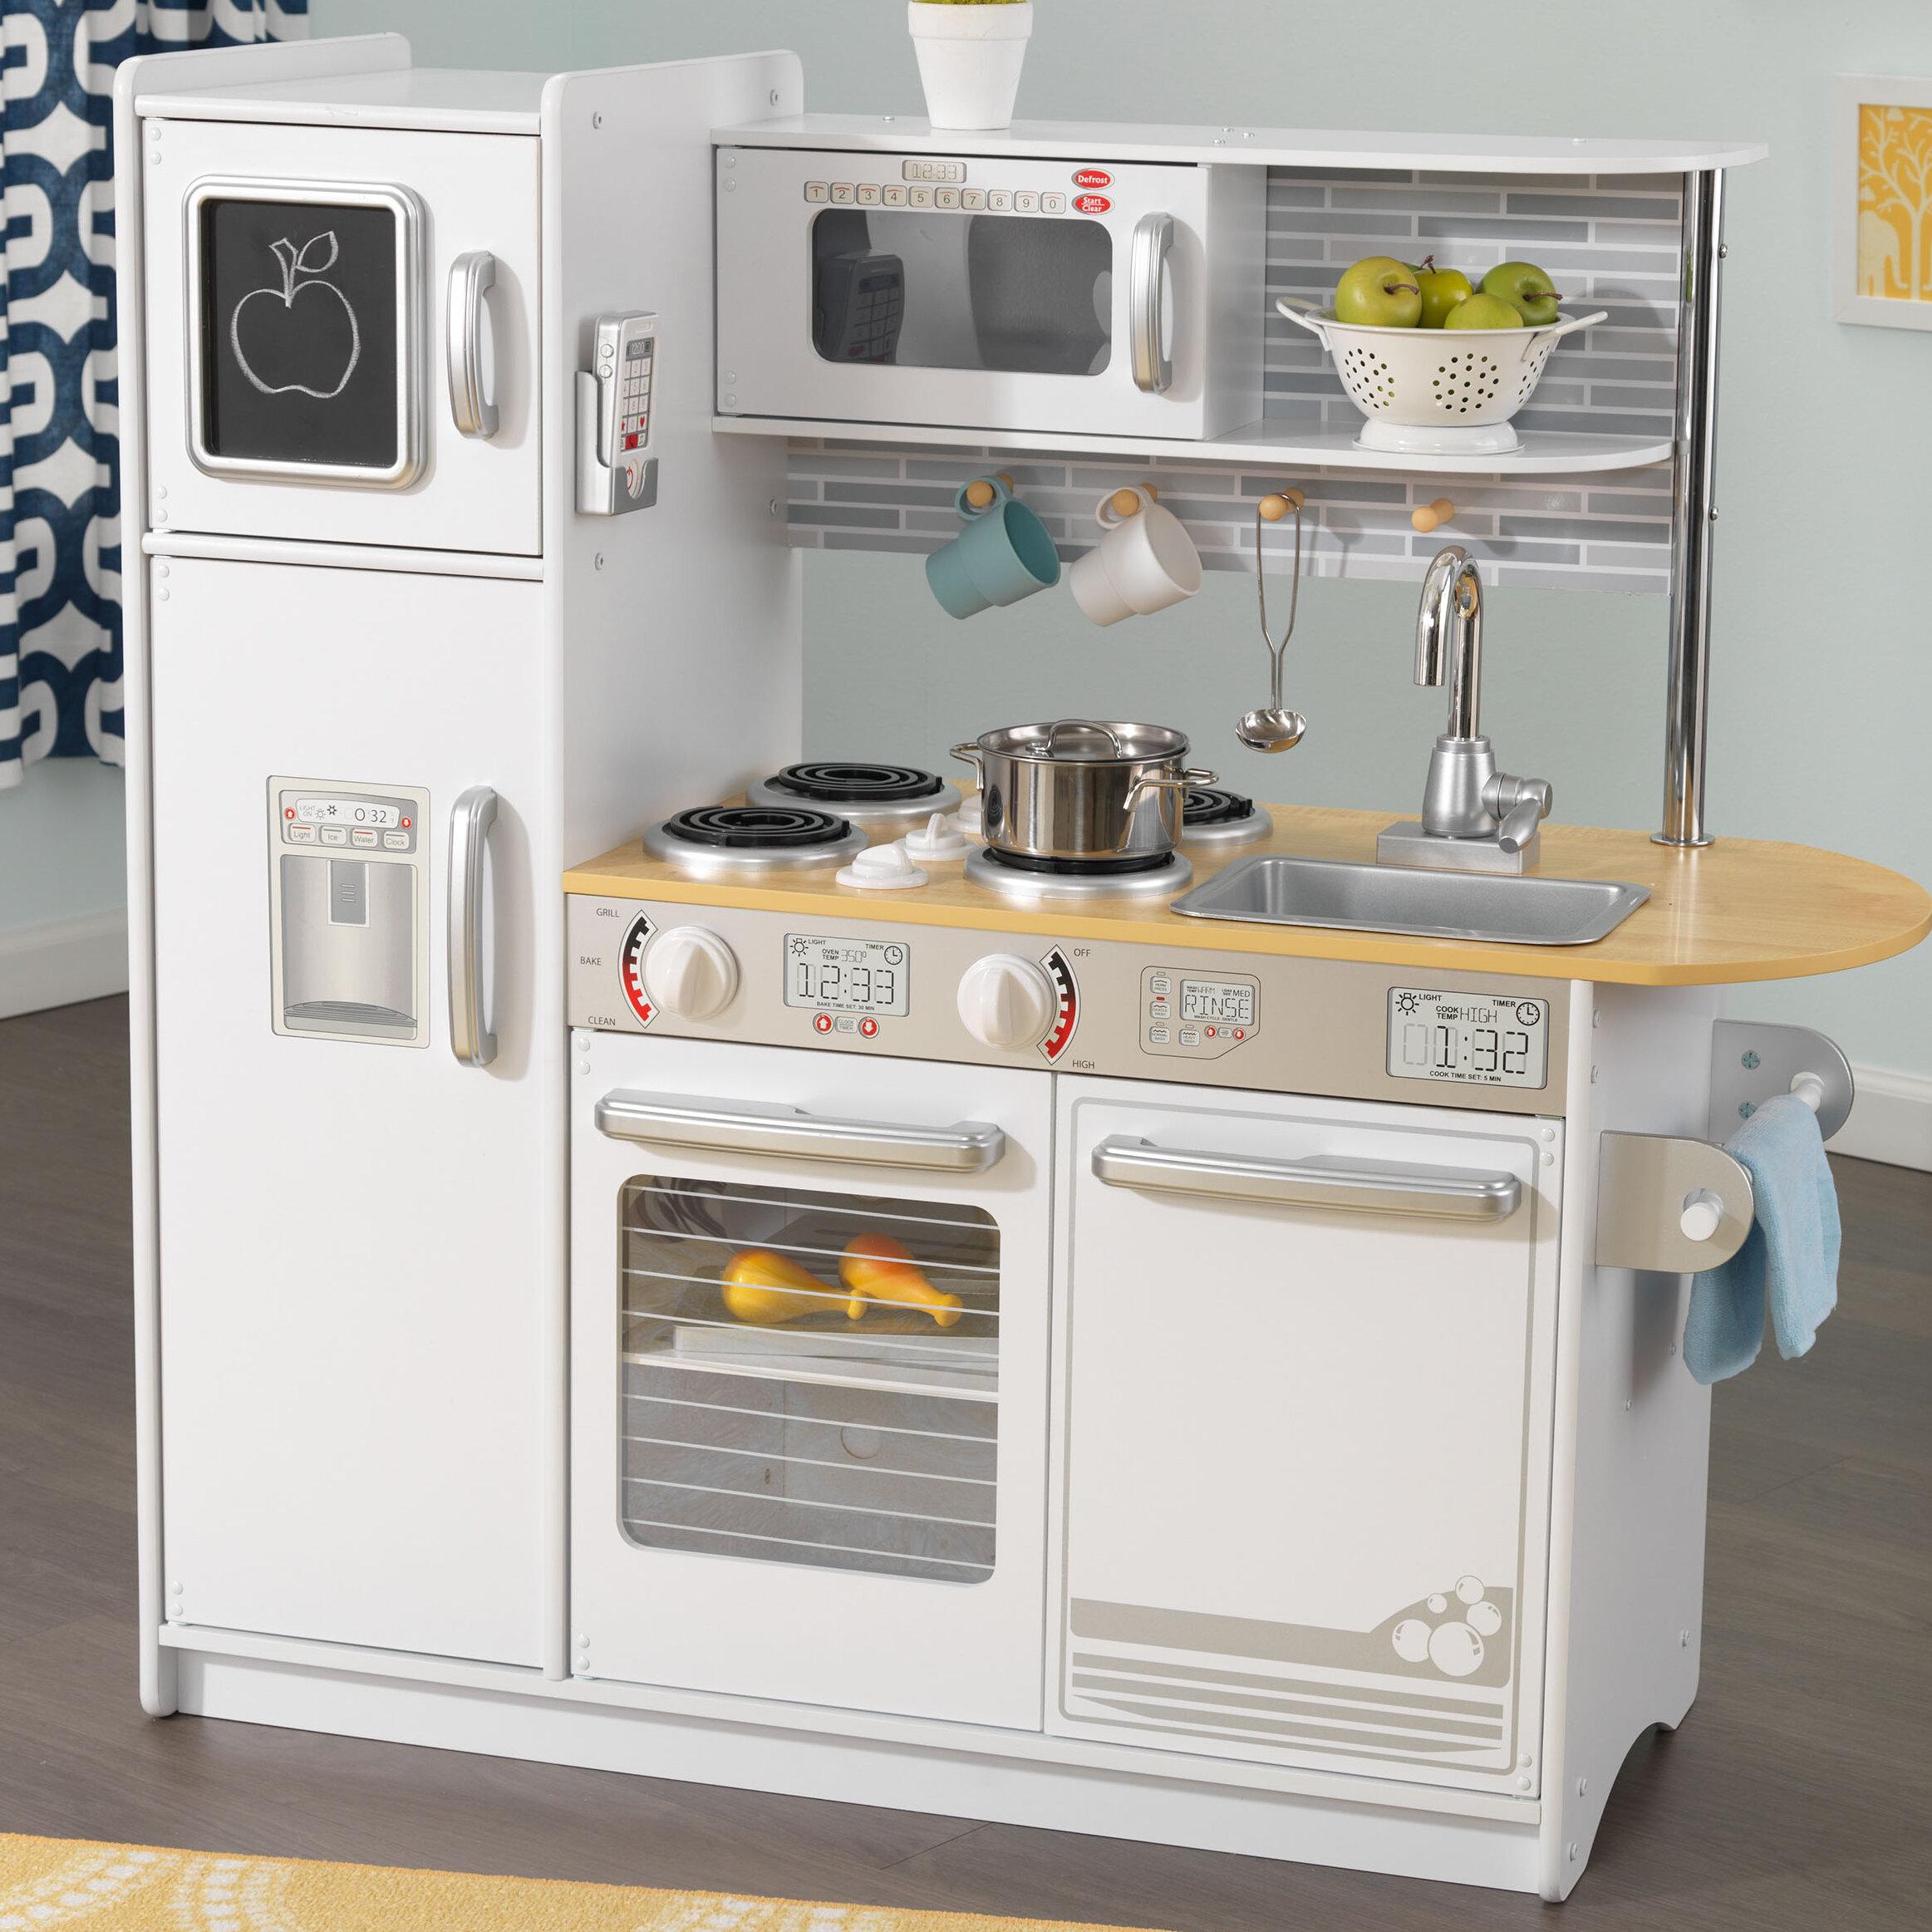 KidKraft Uptown Play Kitchen Set & Reviews | Wayfair